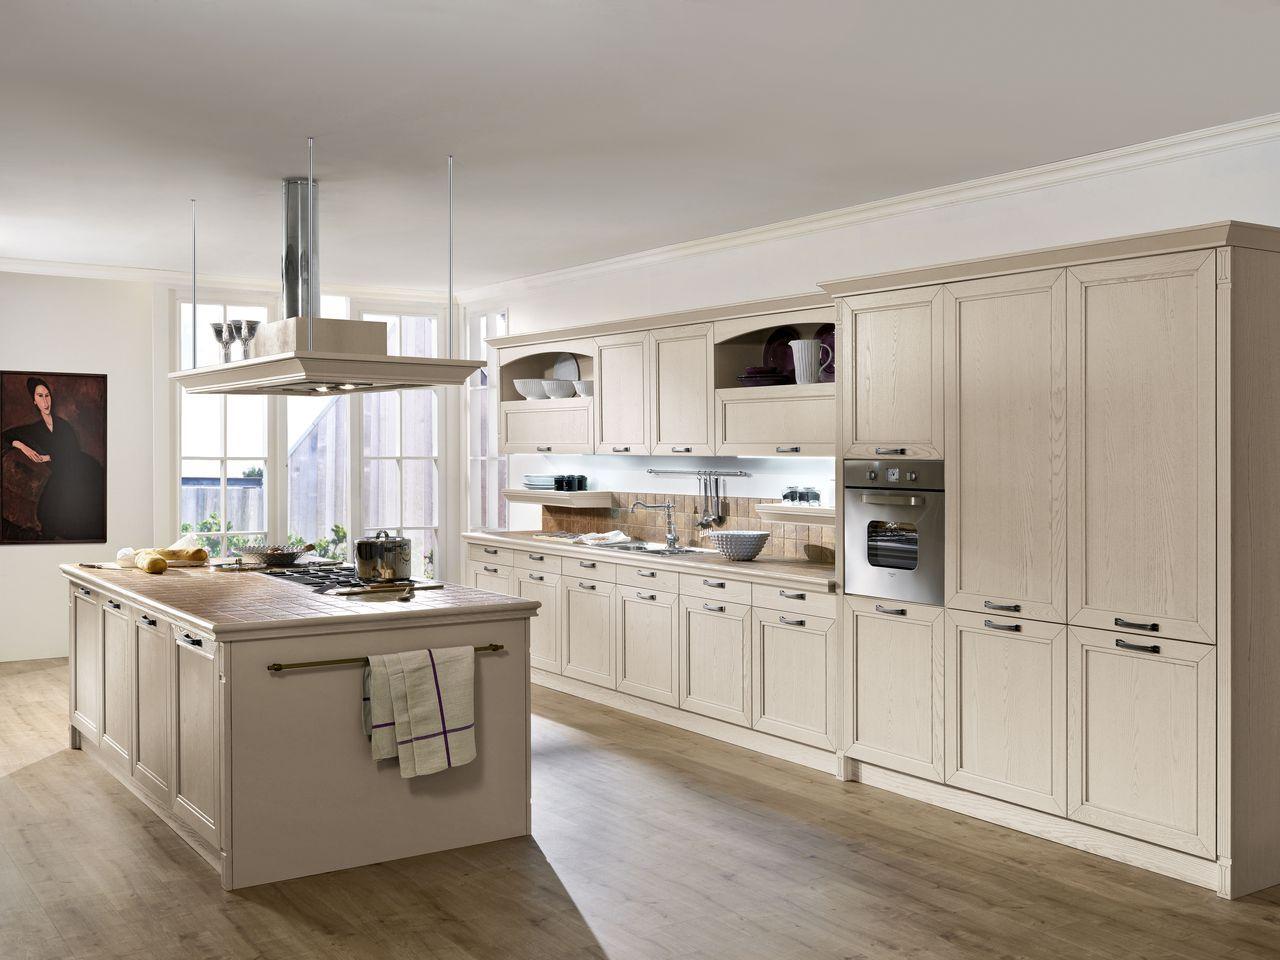 cucina opera arredo 3 - Cerca con Google | my house | Pinterest ...